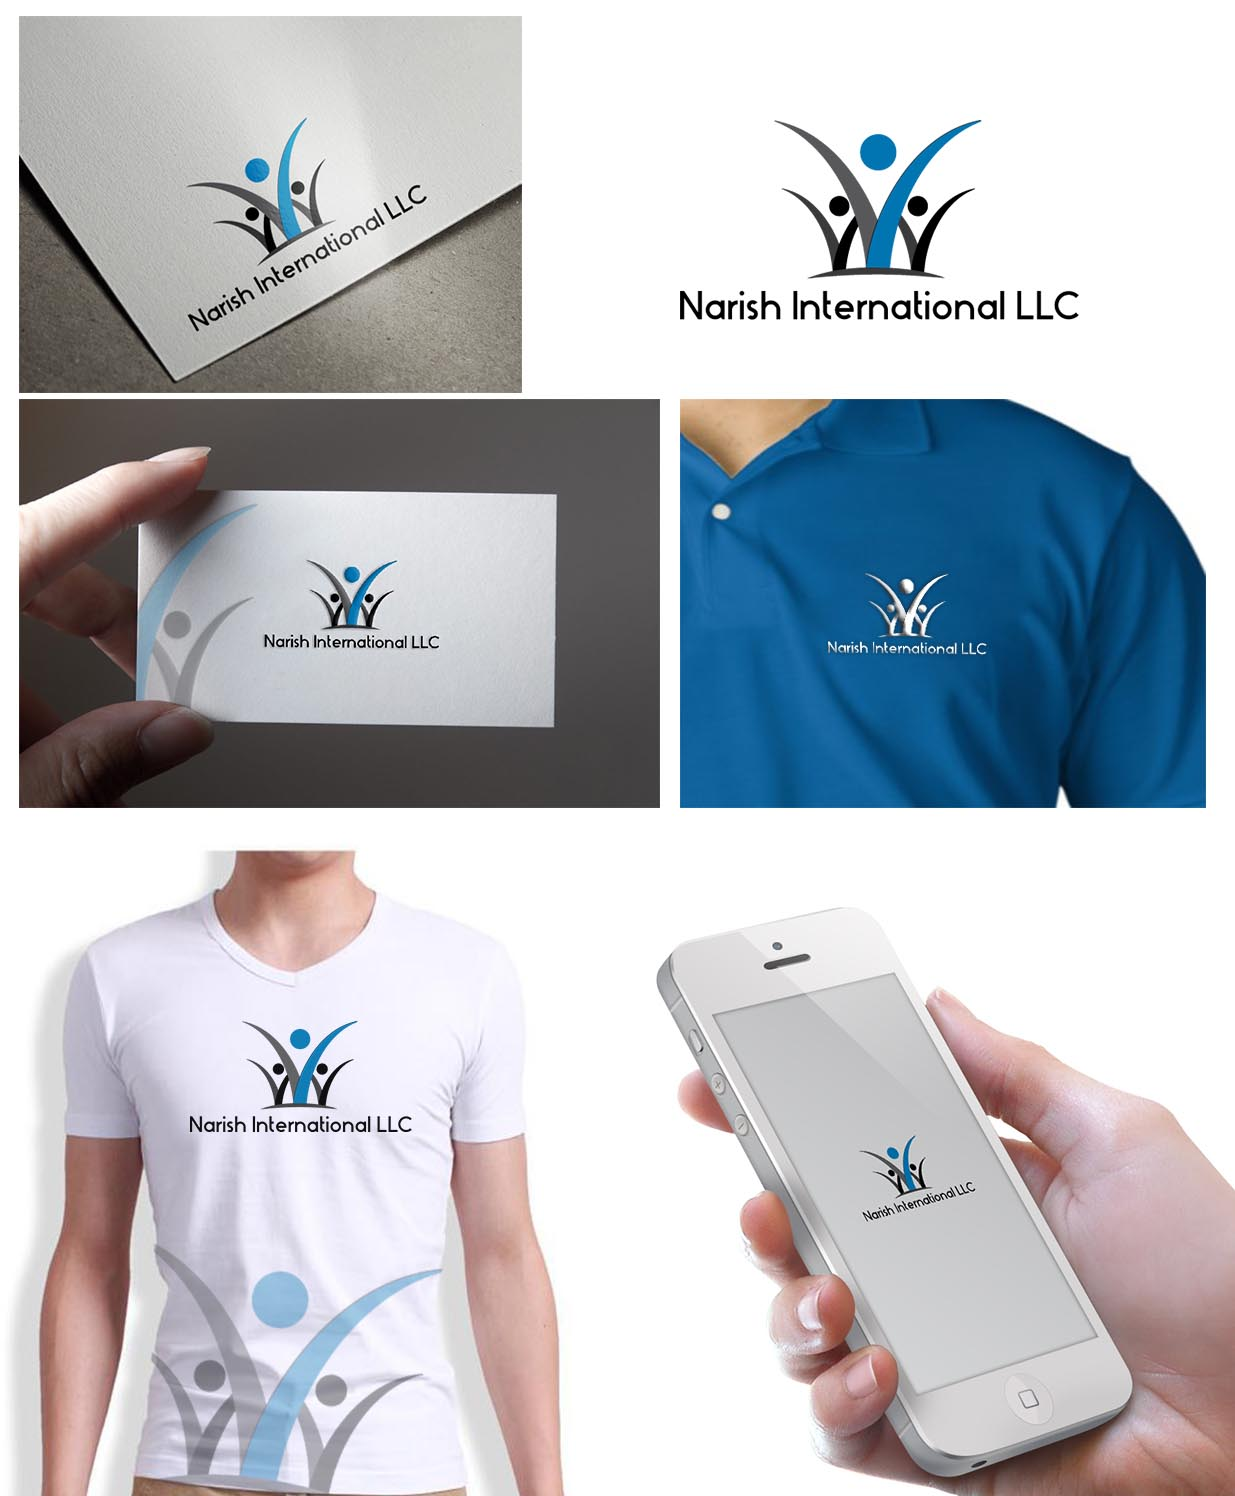 Juguet n vistoso business dise o de logo for narish for Hispano international decor llc